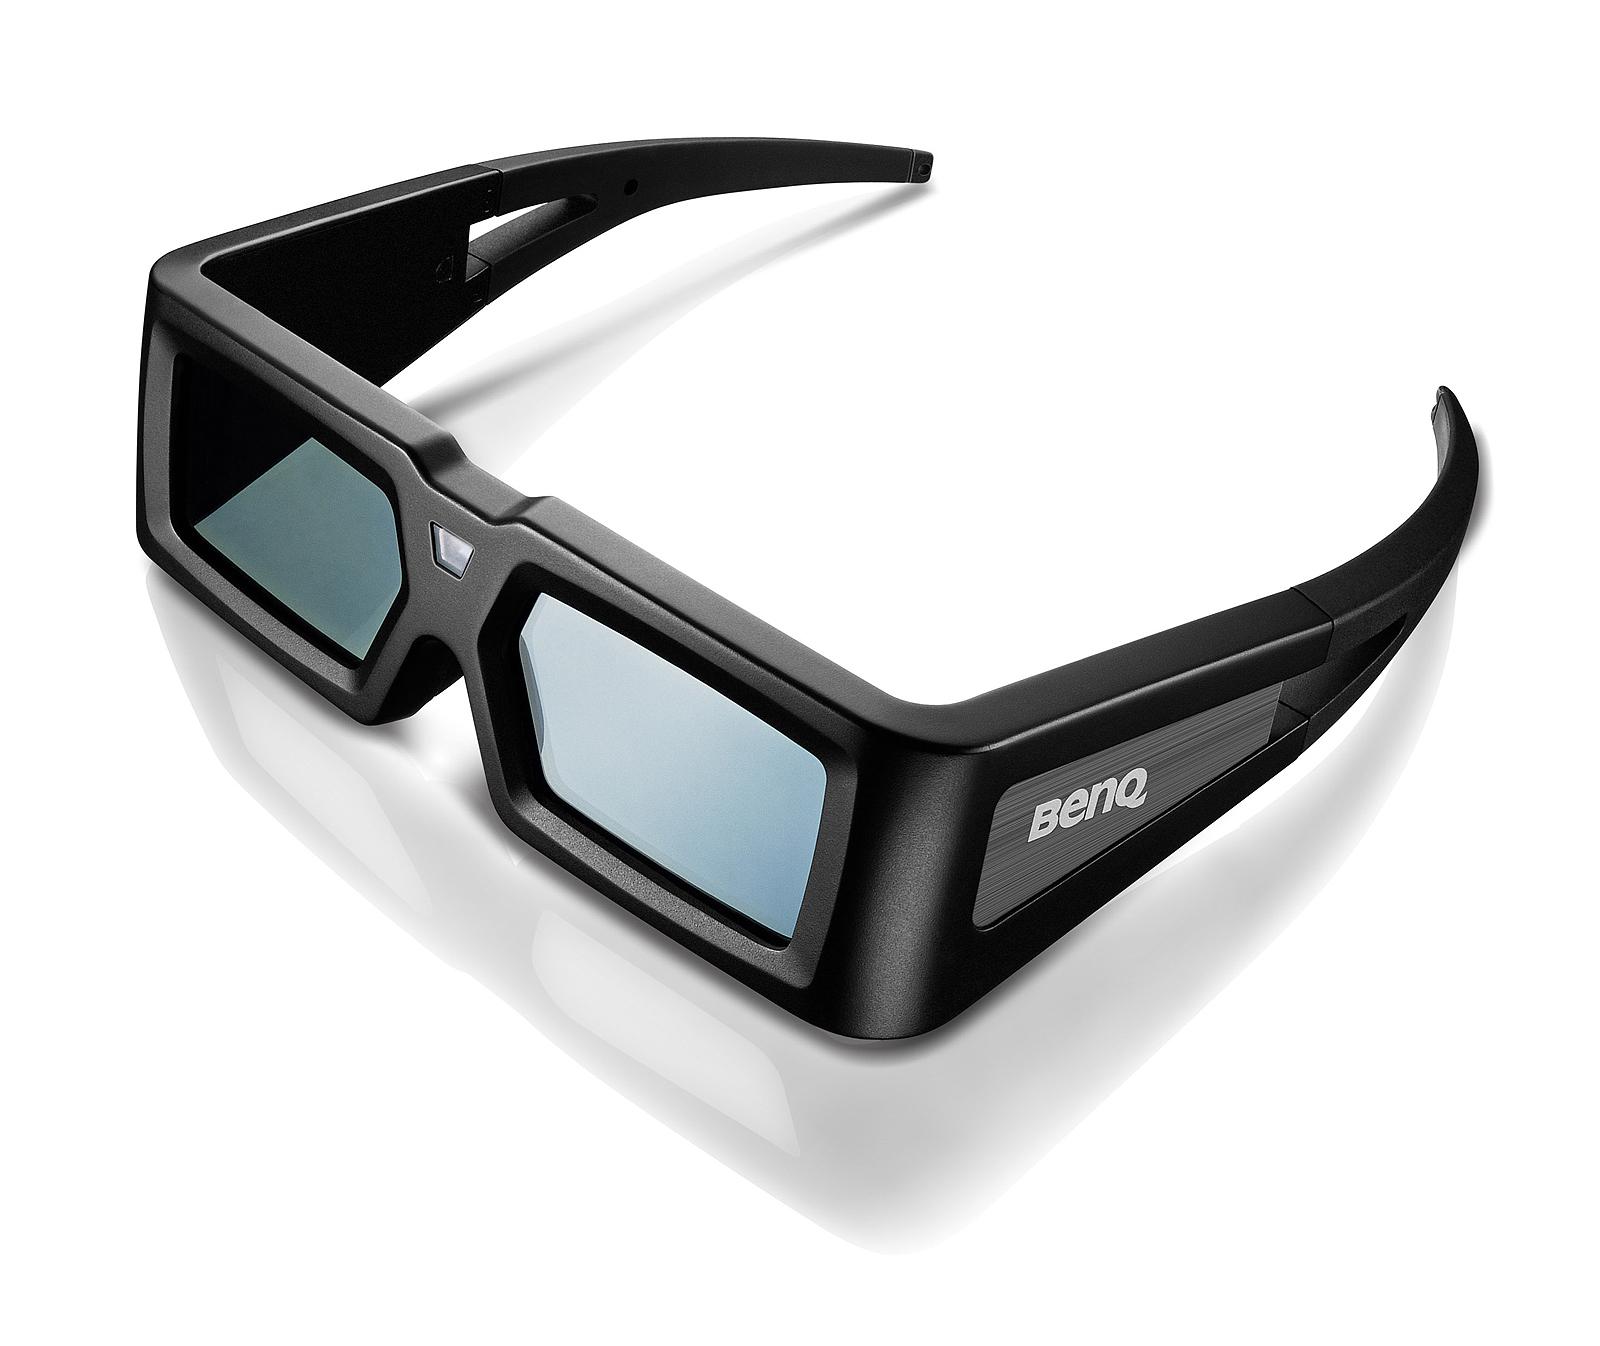 3d очки benq dlp link время отклика 1 7 мс